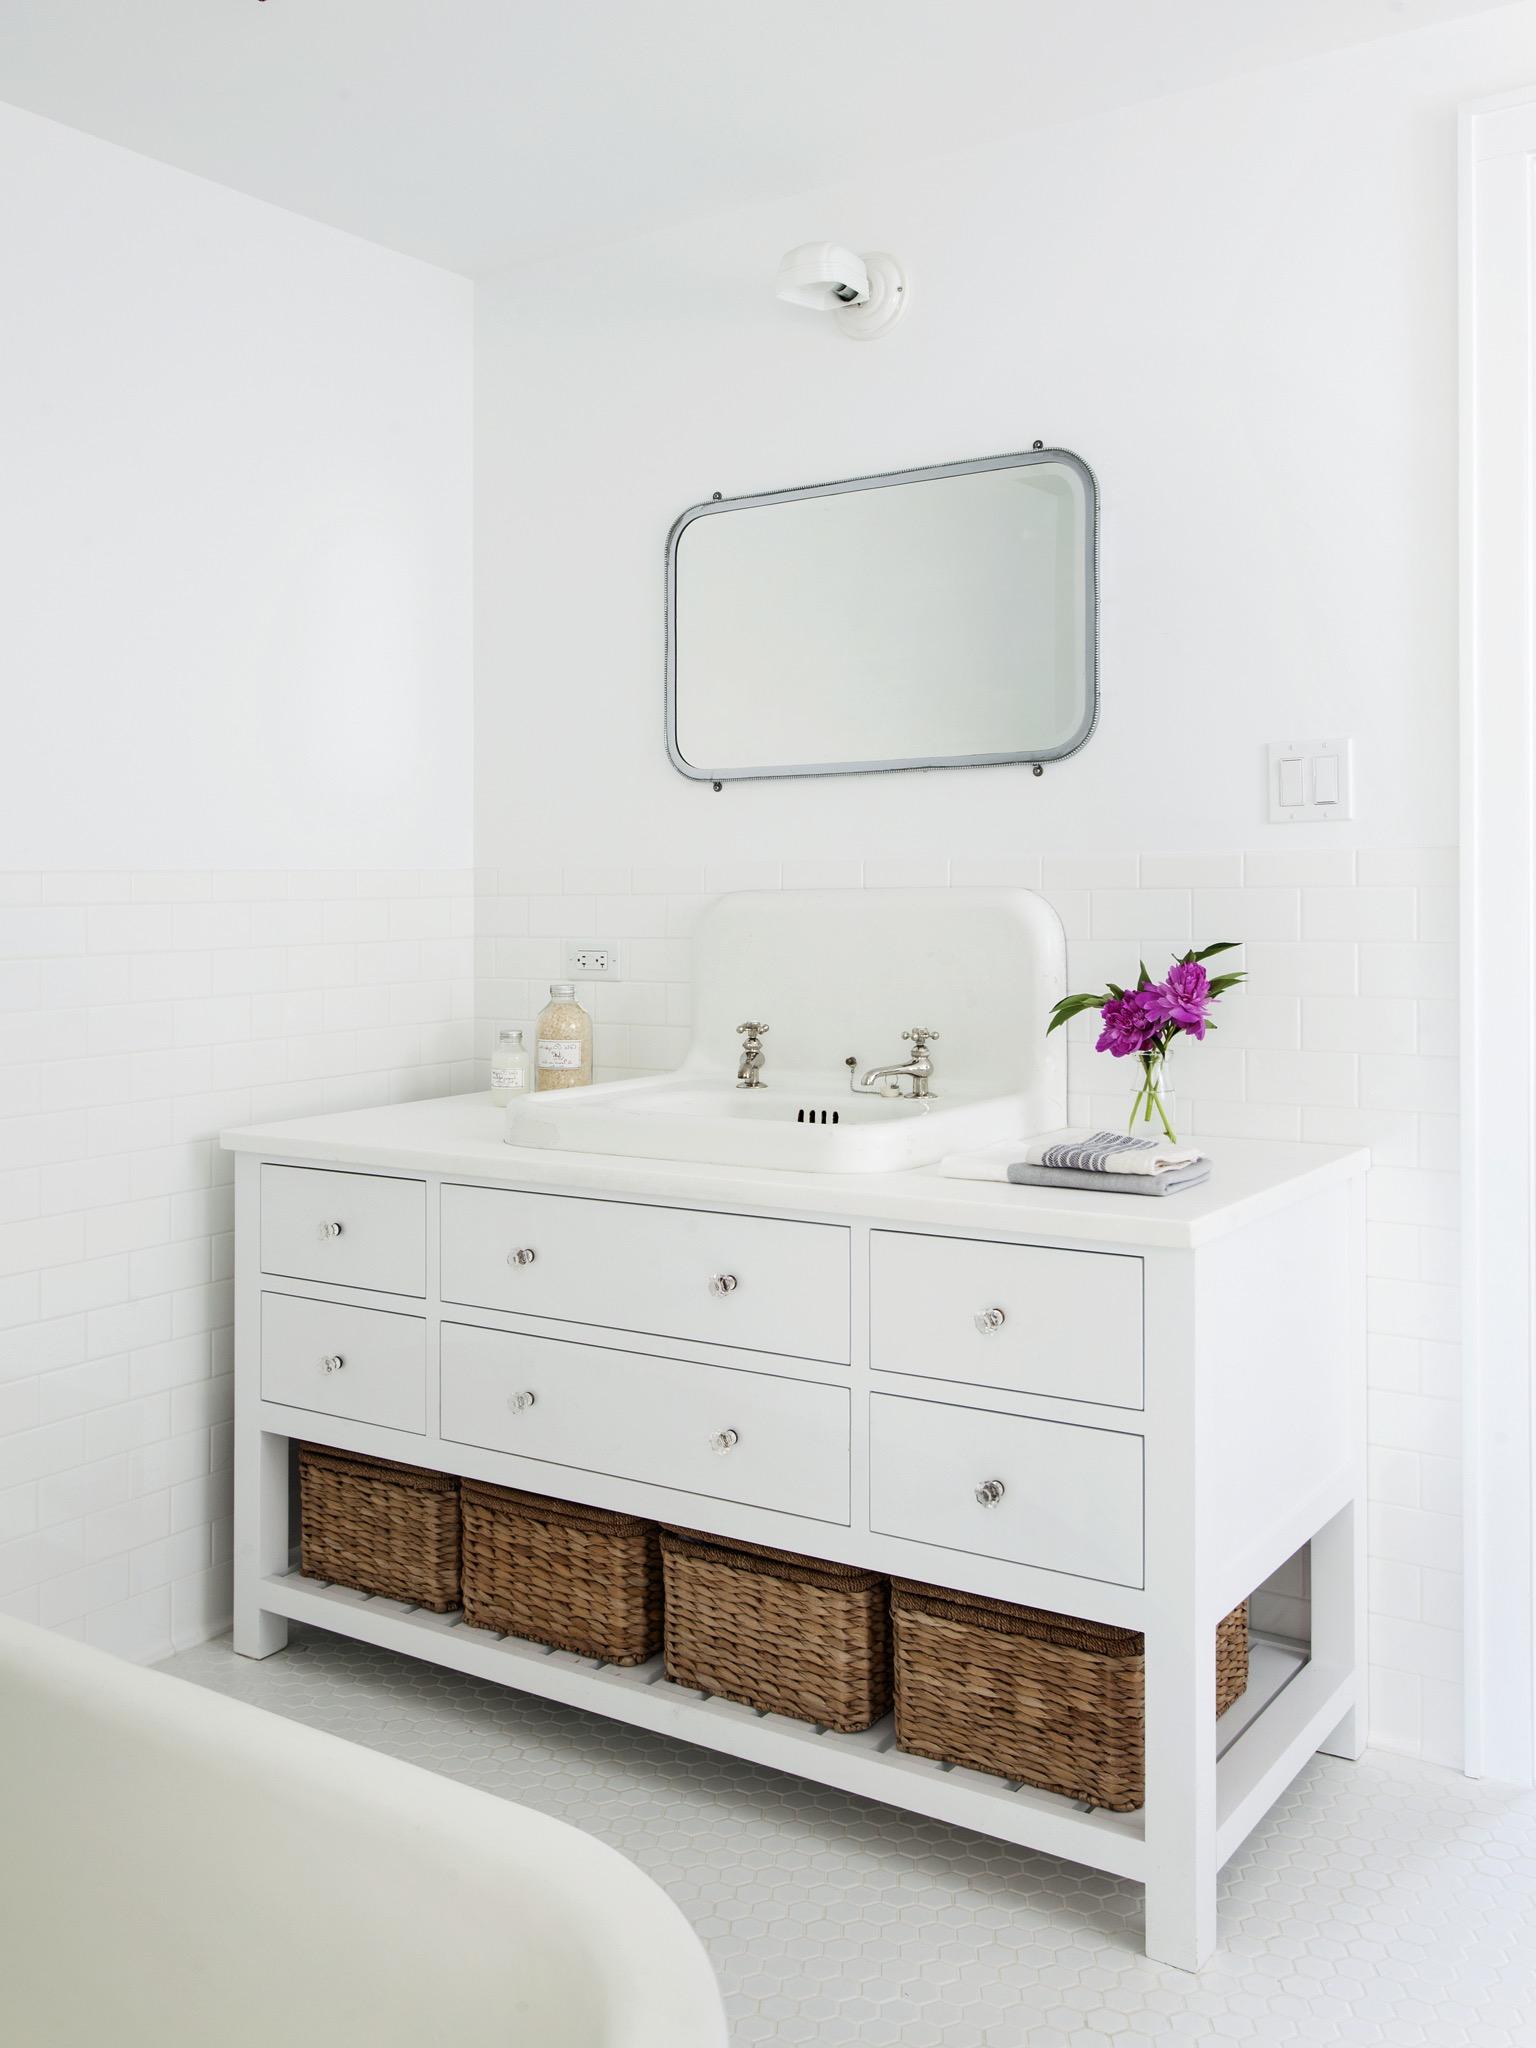 Minimalist White Bathroom Vanity Storage (Image 10 of 20)